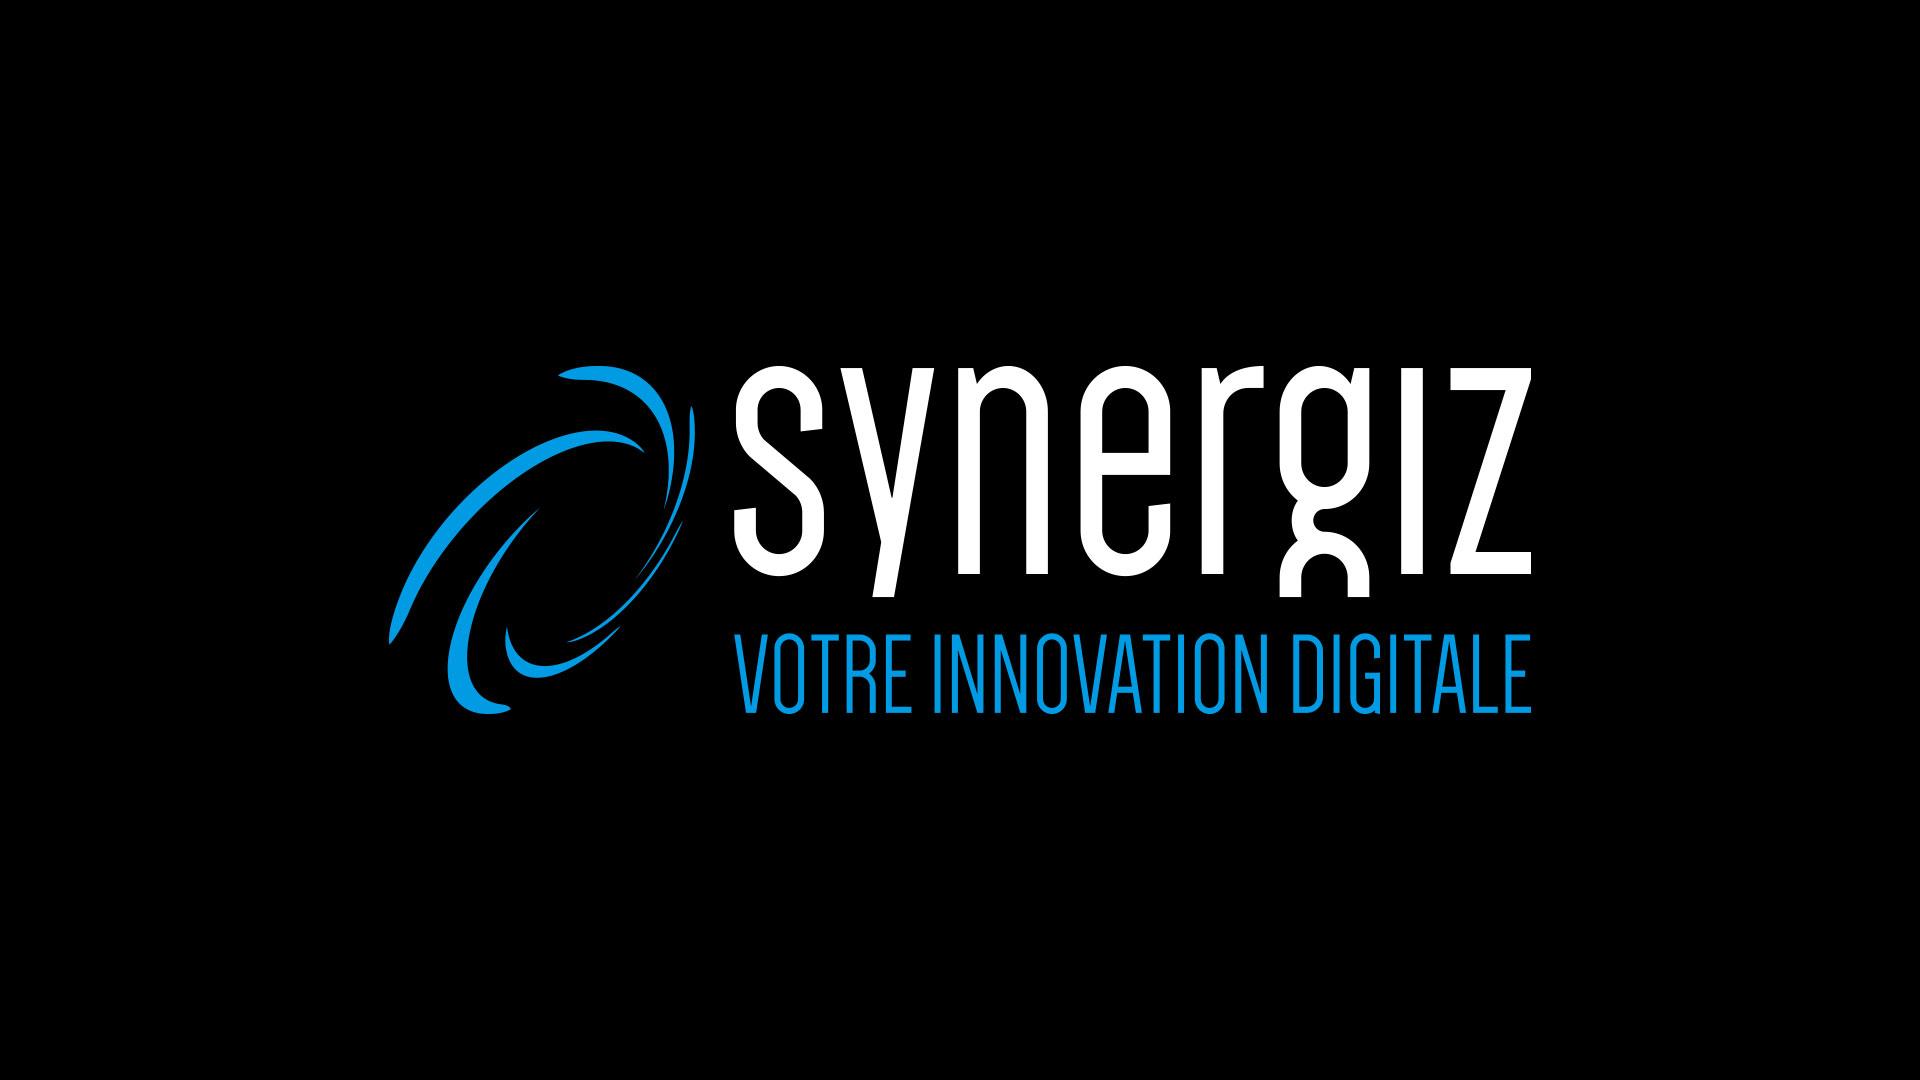 Synergiz